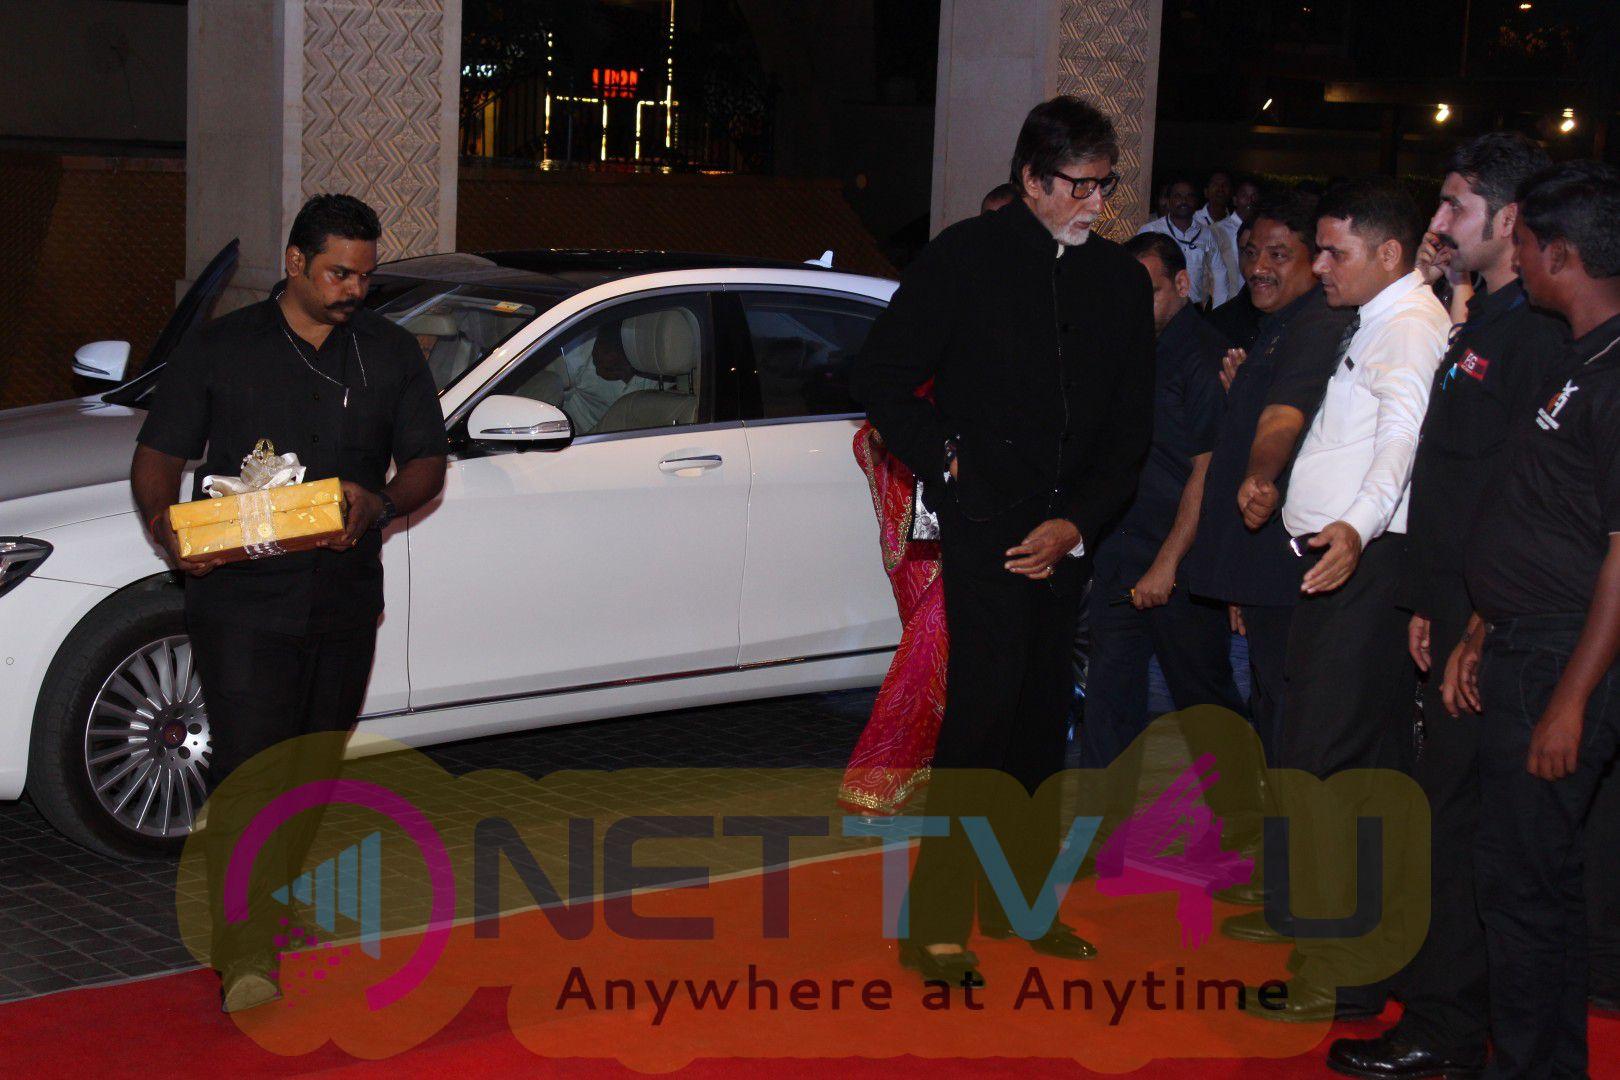 Neil Nitin Mukesh And Rukmini Sahay Reception Amitabh Bachchan-Jaya, Madhur Bhandarkar, Pooja Hegde Attend Photos Hindi Gallery